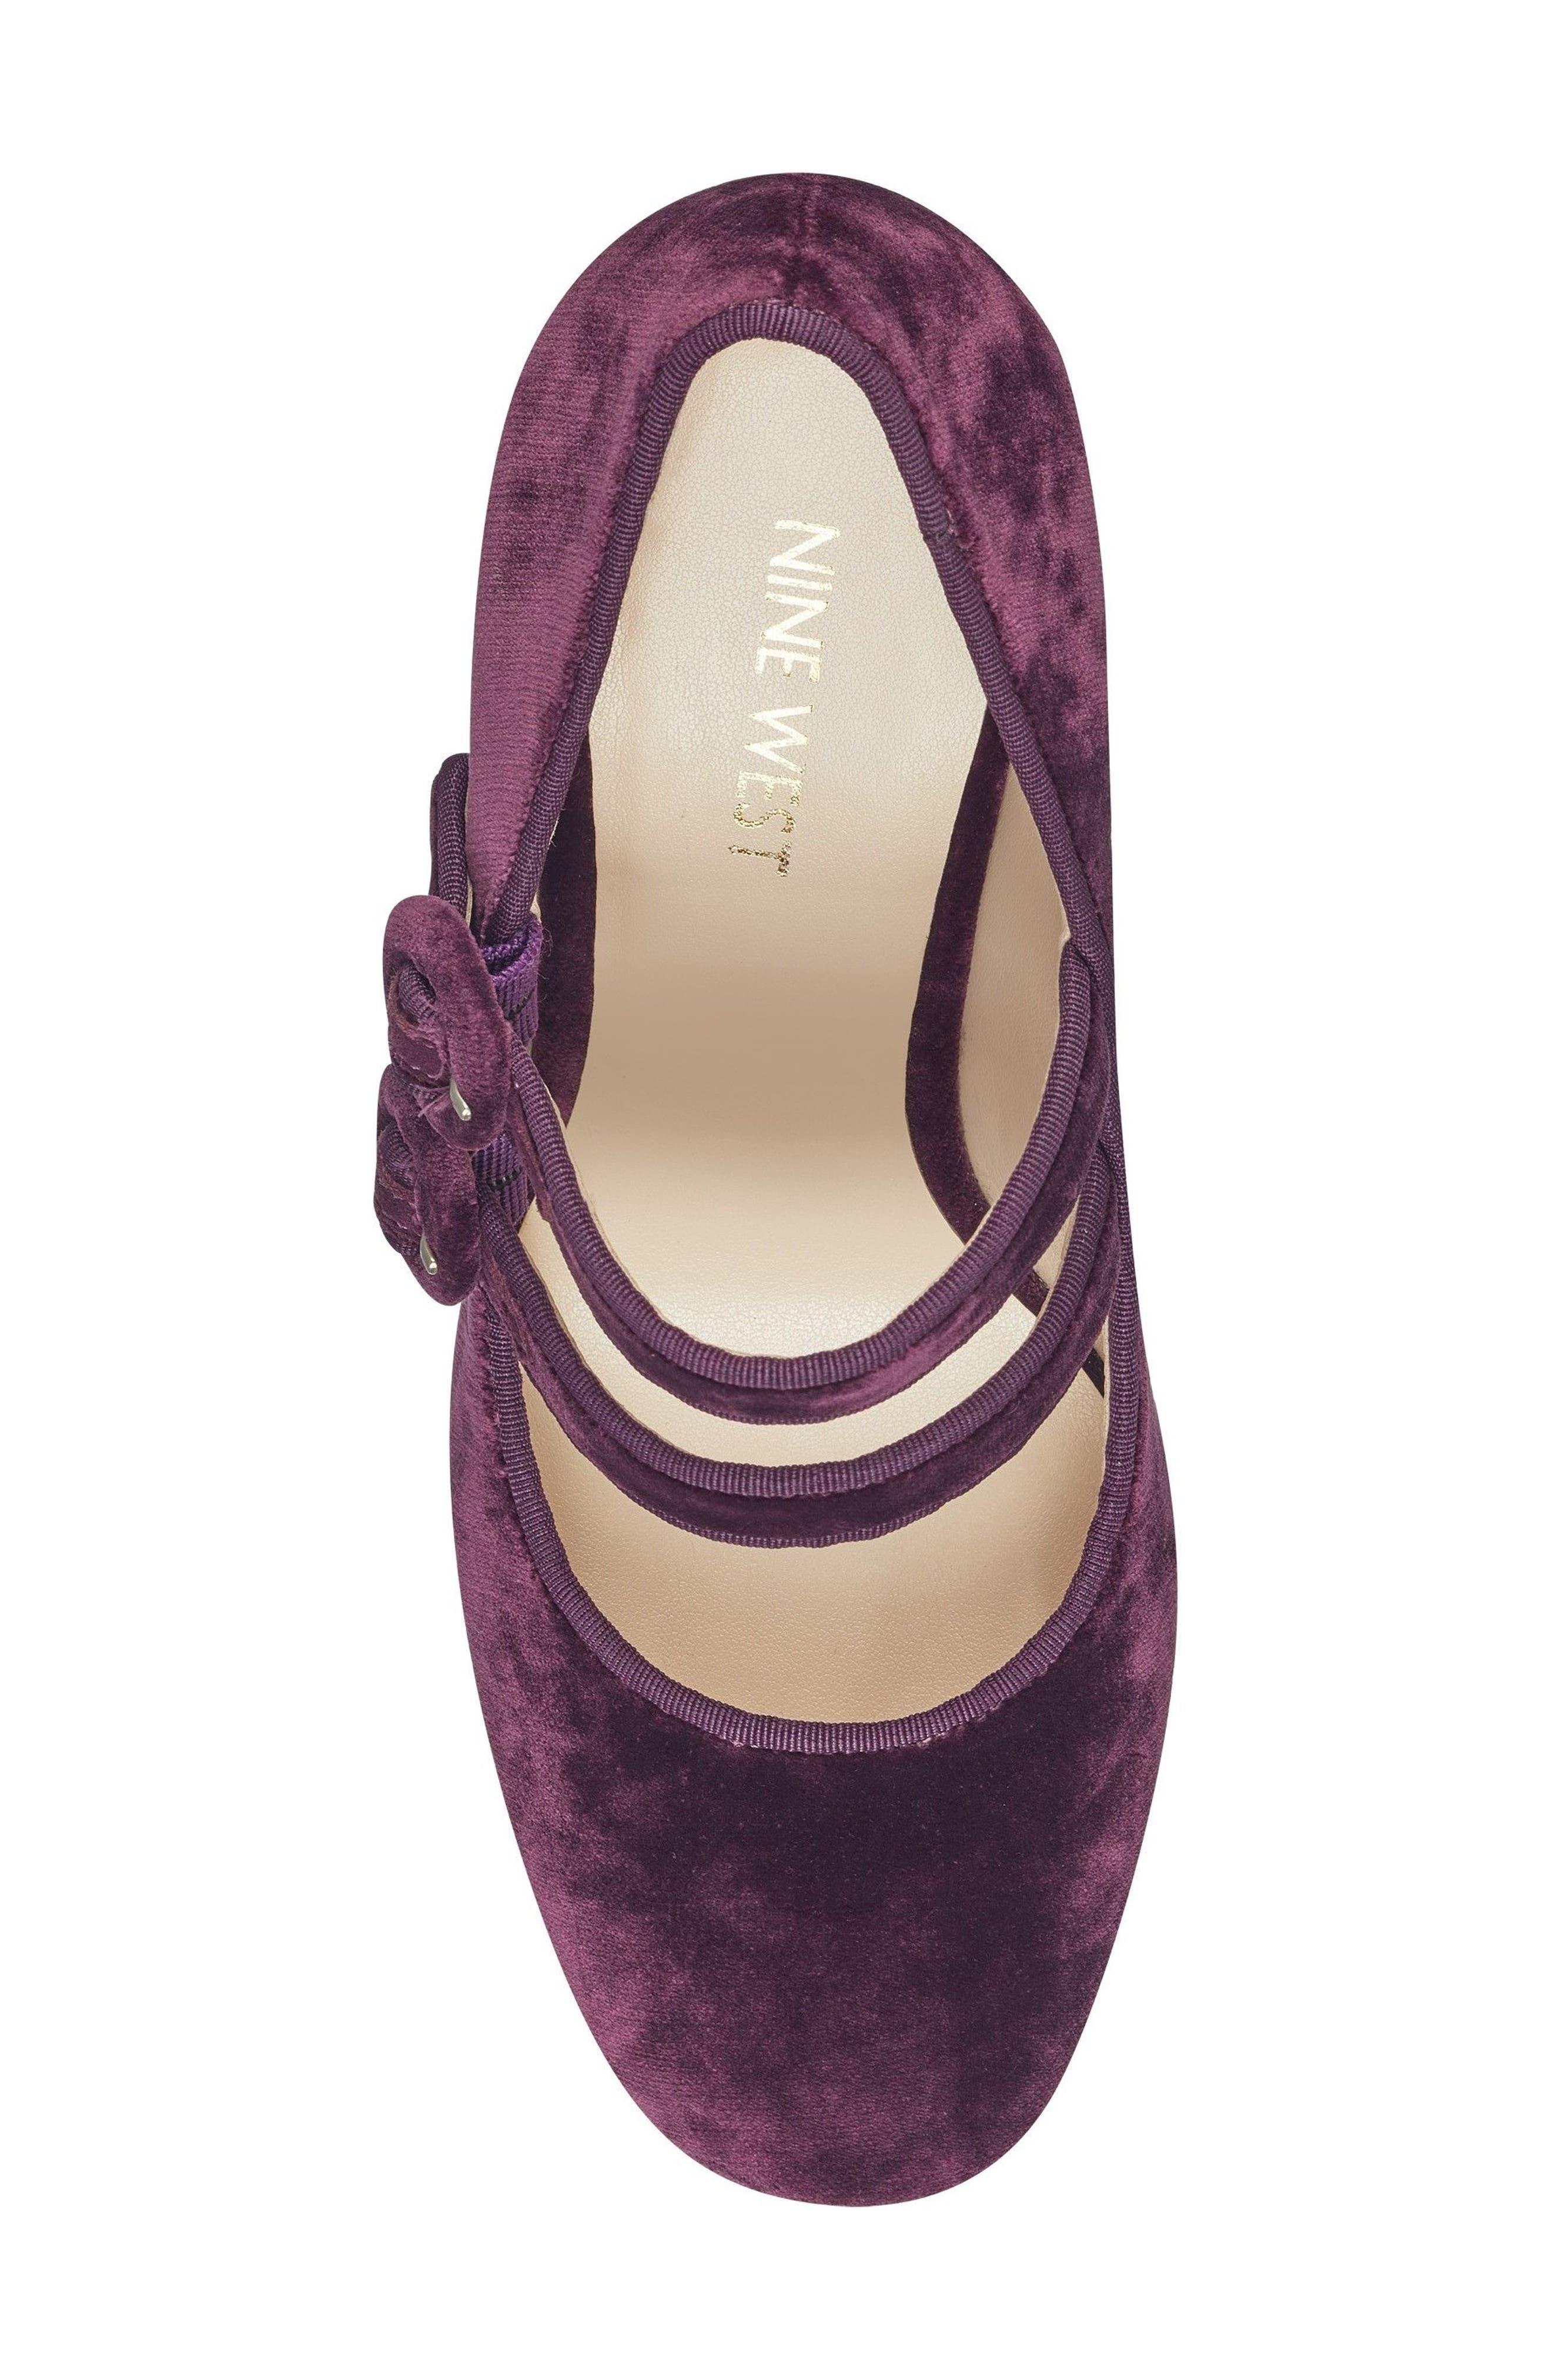 Dabney Double Strap Mary Jane Pump,                             Alternate thumbnail 5, color,                             Dark Purple Fabric